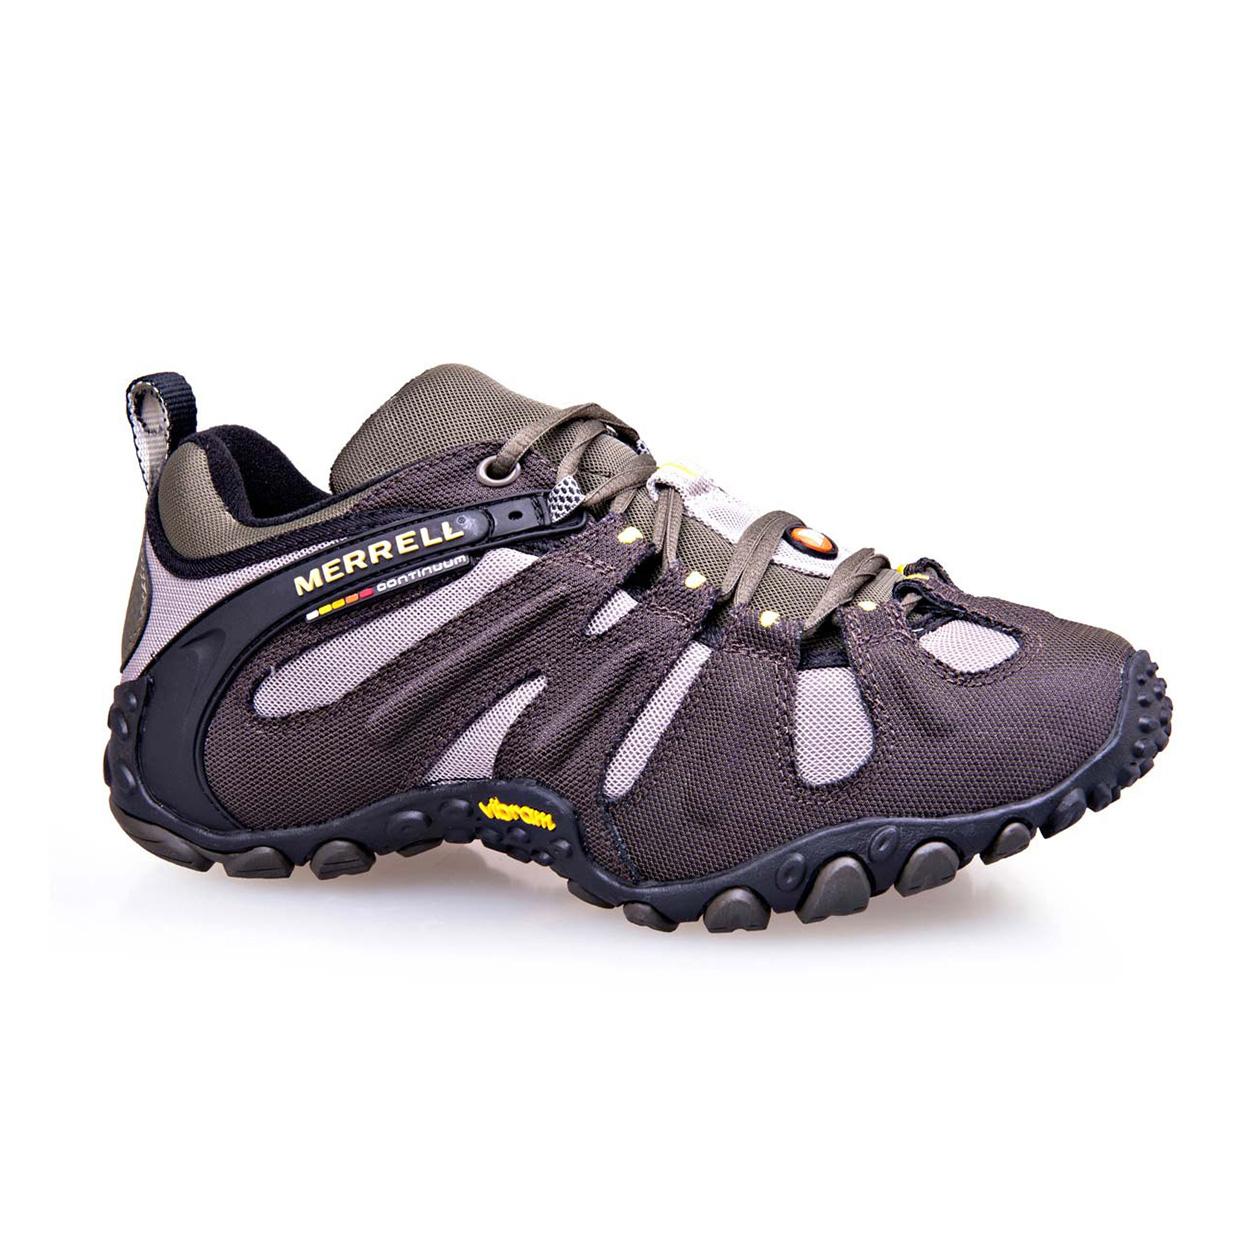 Chaussures homme Randonnée Randonnée AW19 Merrell Moab 2